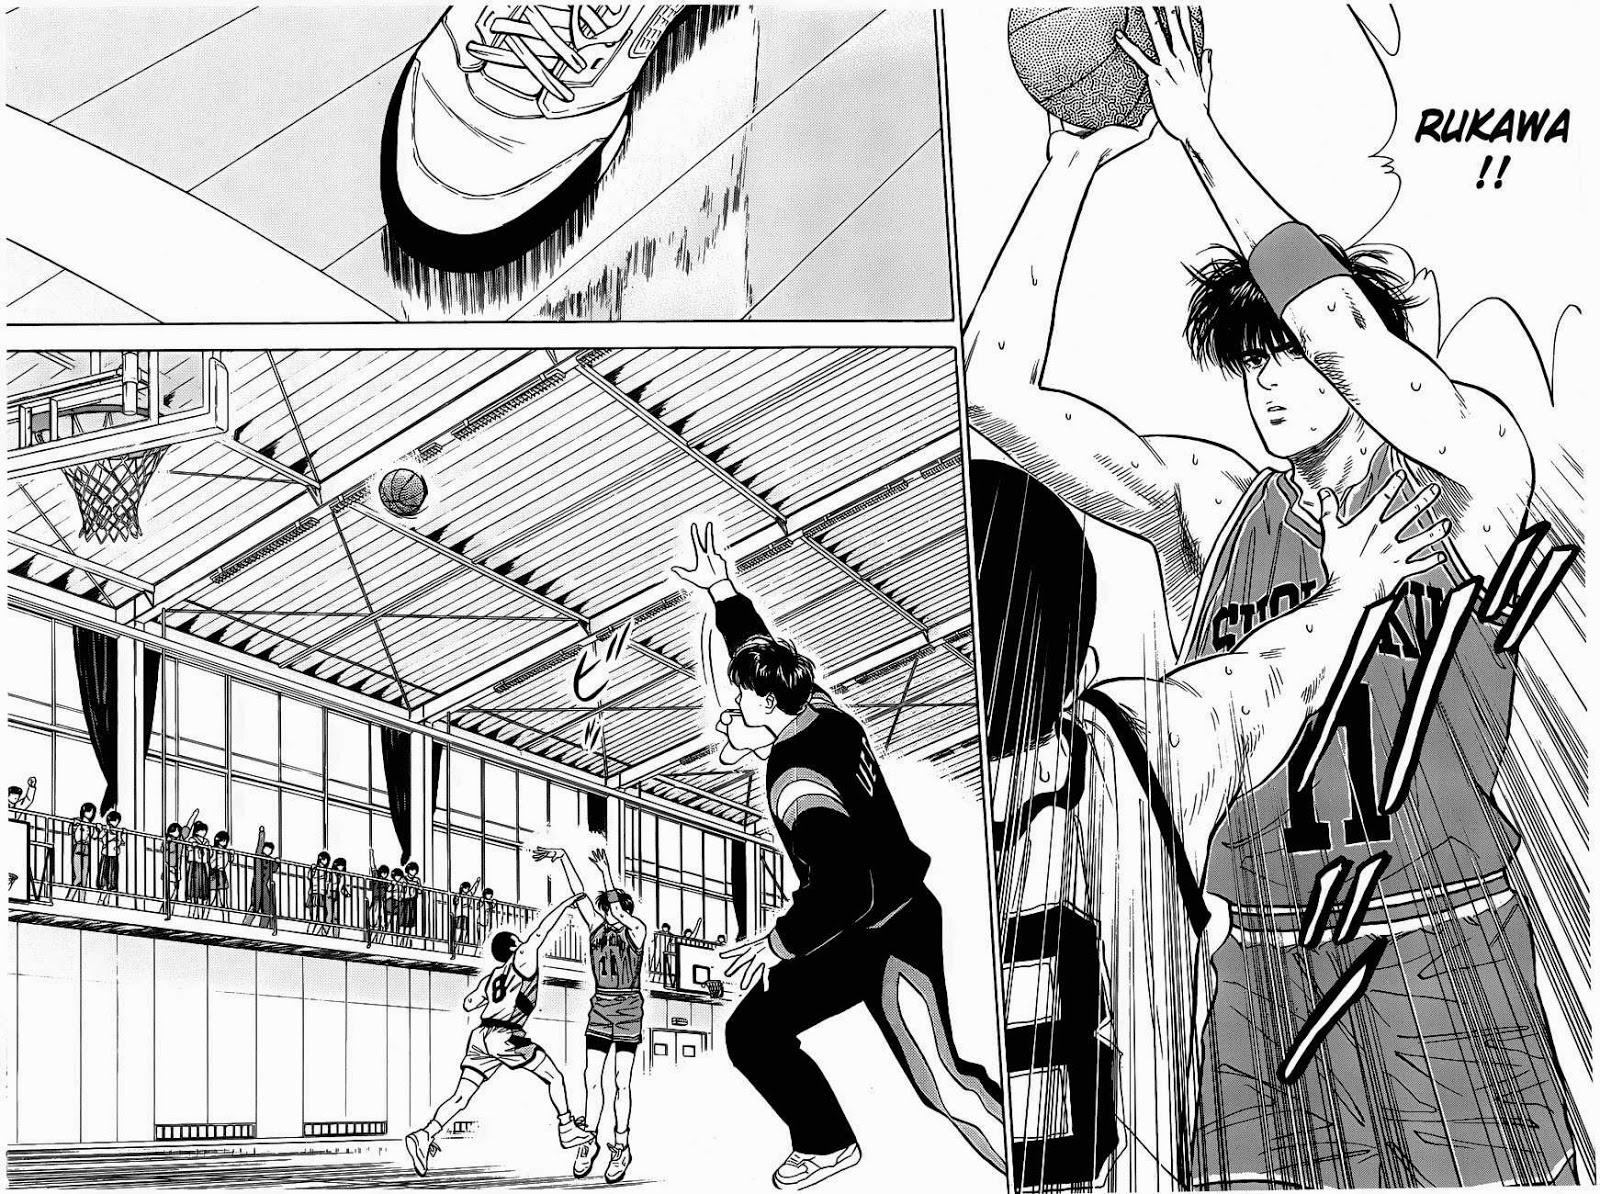 Komik slam dunk 045 - chapter 45 46 Indonesia slam dunk 045 - chapter 45 Terbaru 14|Baca Manga Komik Indonesia|